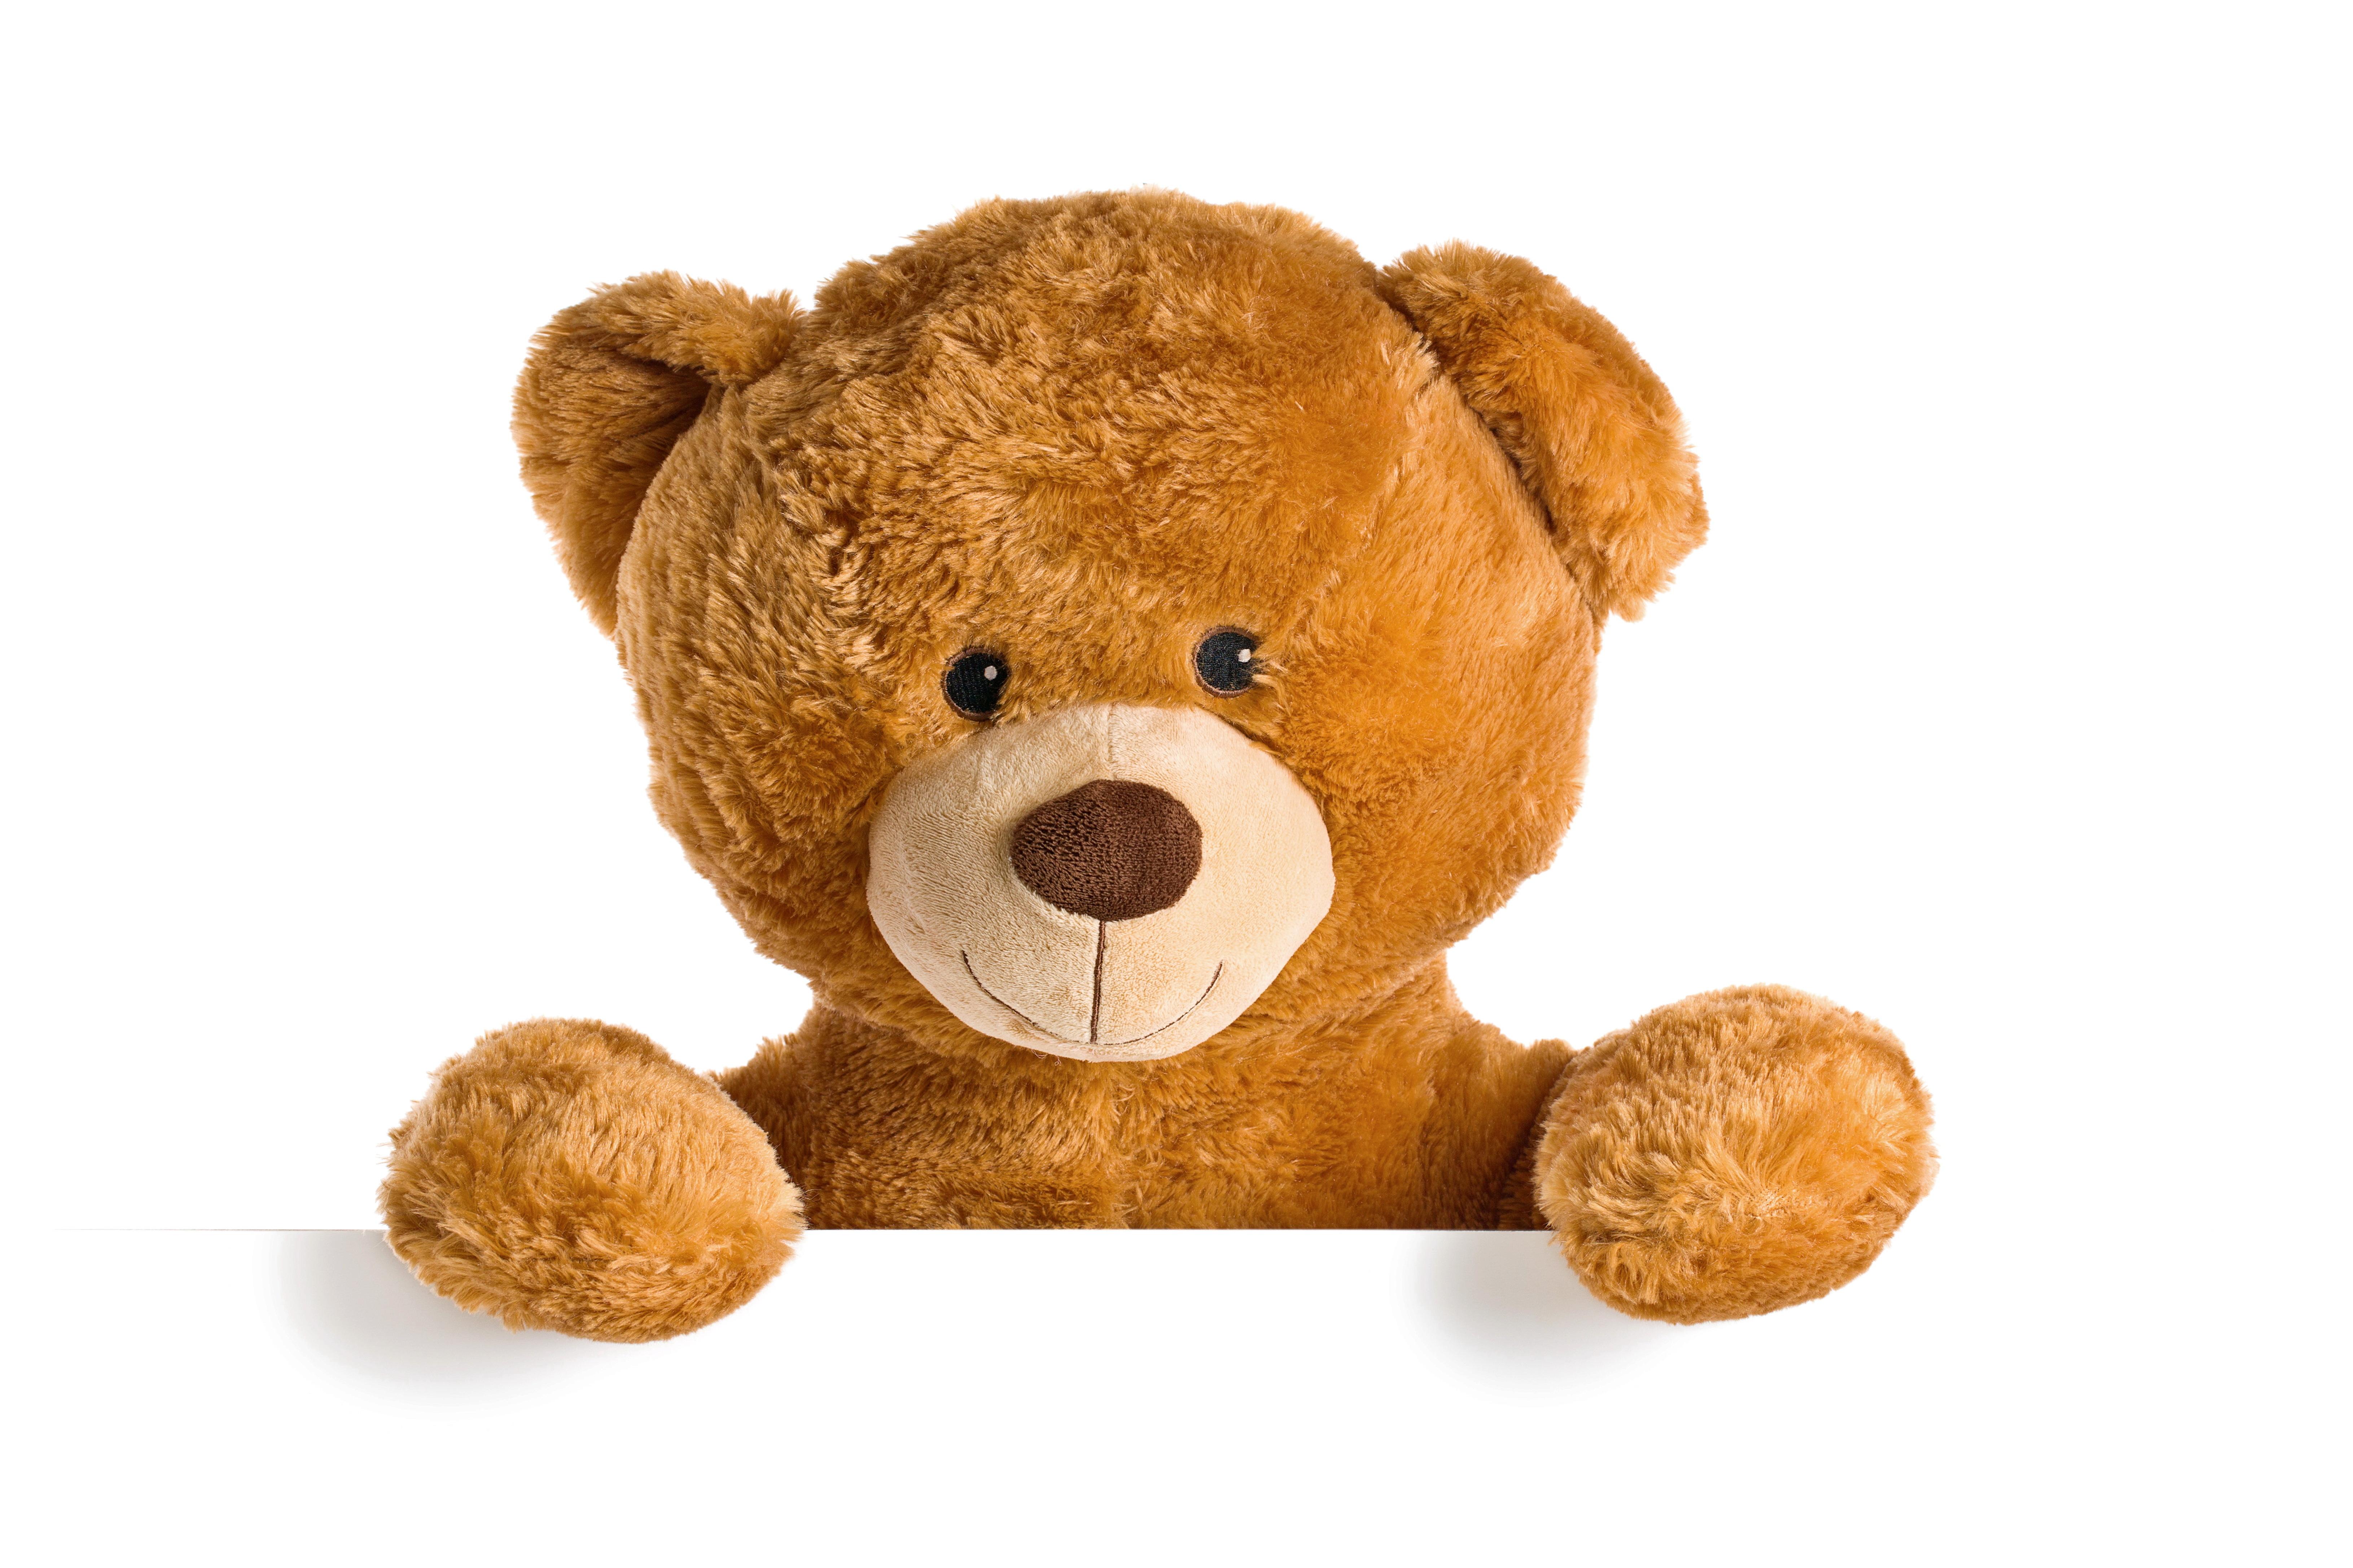 Teddy Bear High Definition Wallpapers